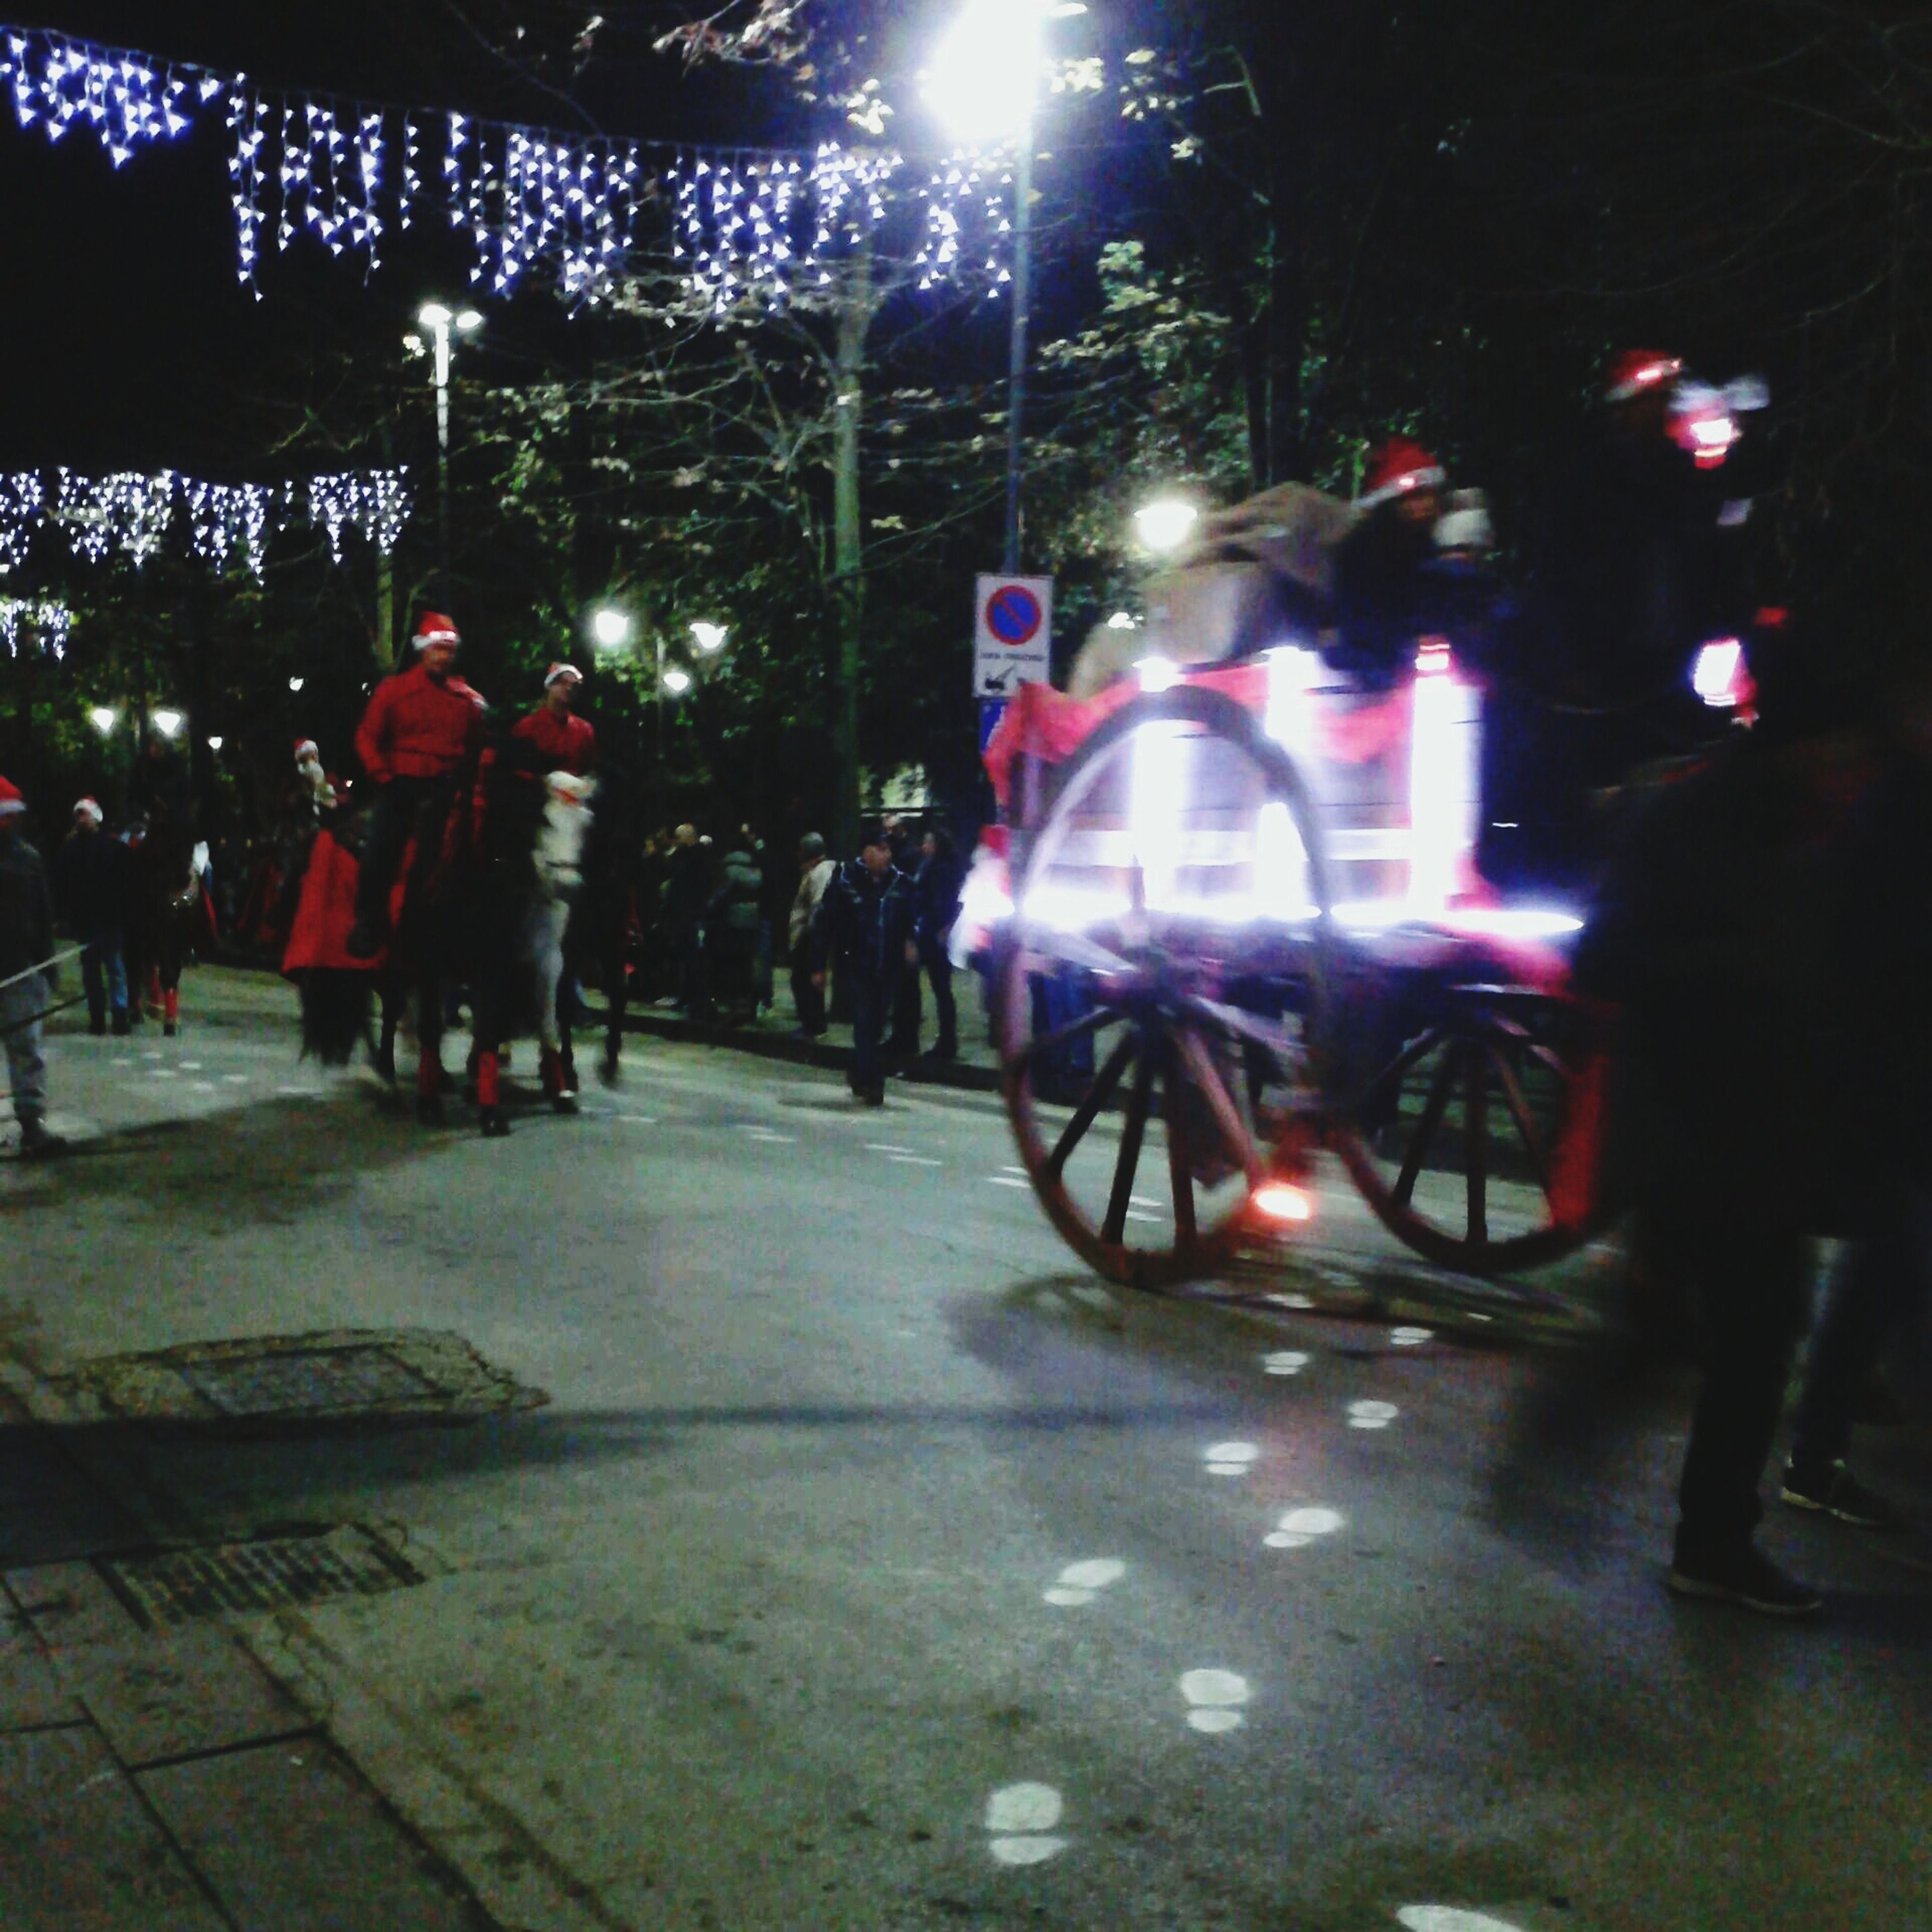 bicycle, transportation, night, street, land vehicle, mode of transport, lifestyles, leisure activity, men, full length, riding, illuminated, road, walking, on the move, shadow, tree, car